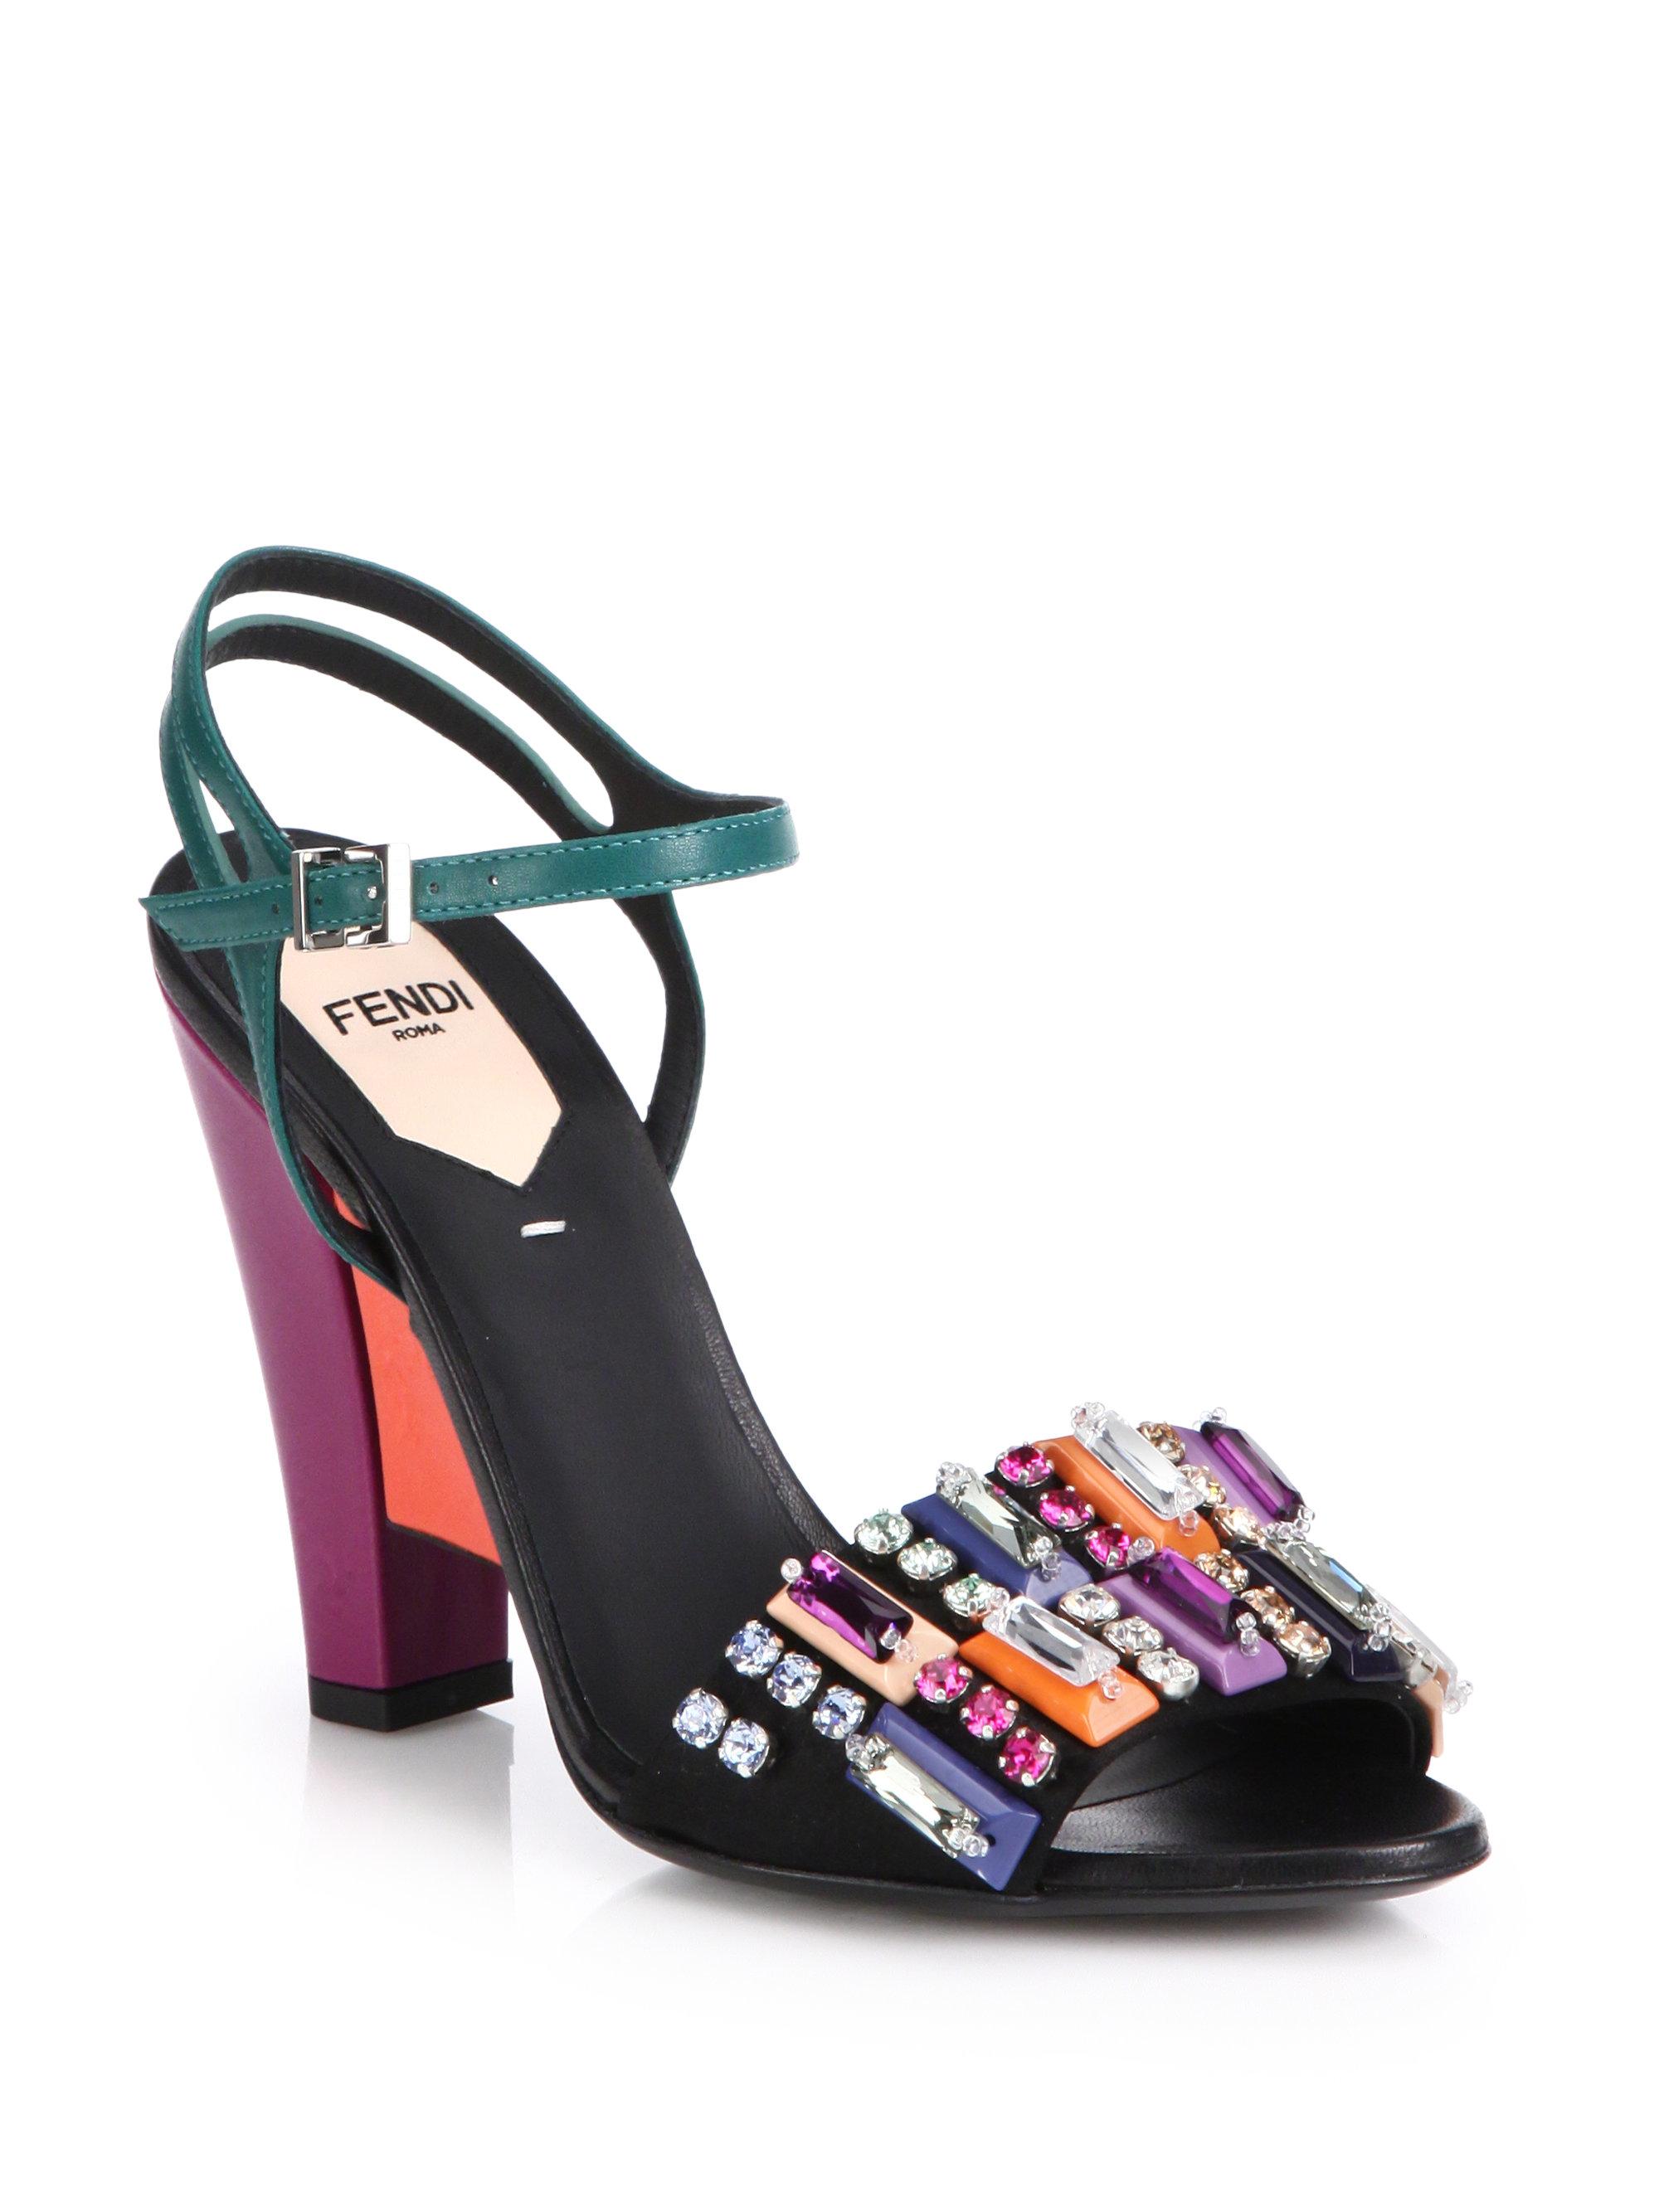 47763766ae4cc2 Lyst - Fendi Bejeweled Colorblock Leather Sandals